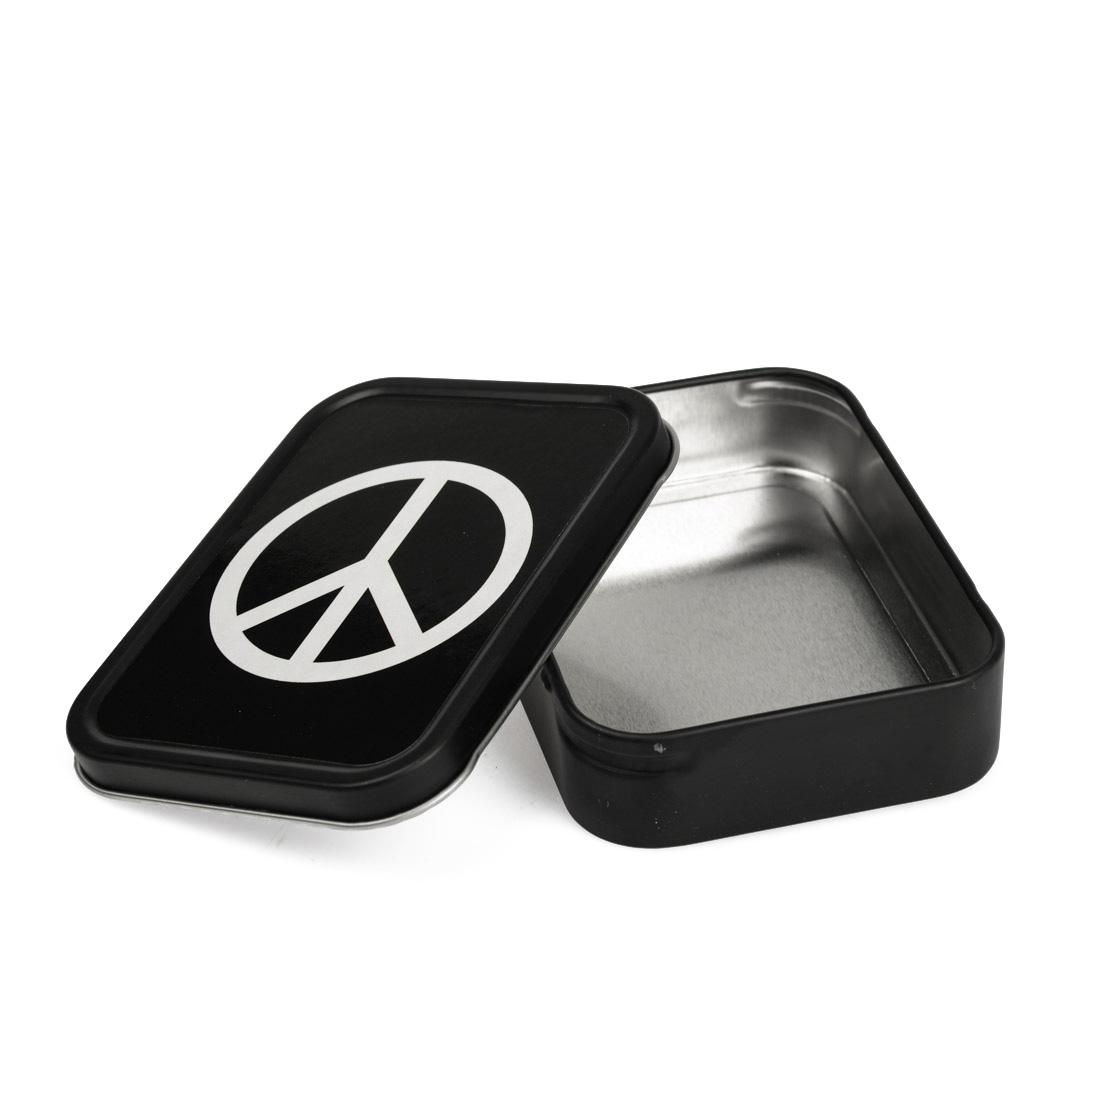 BOITE METAL PEACE & LOVE